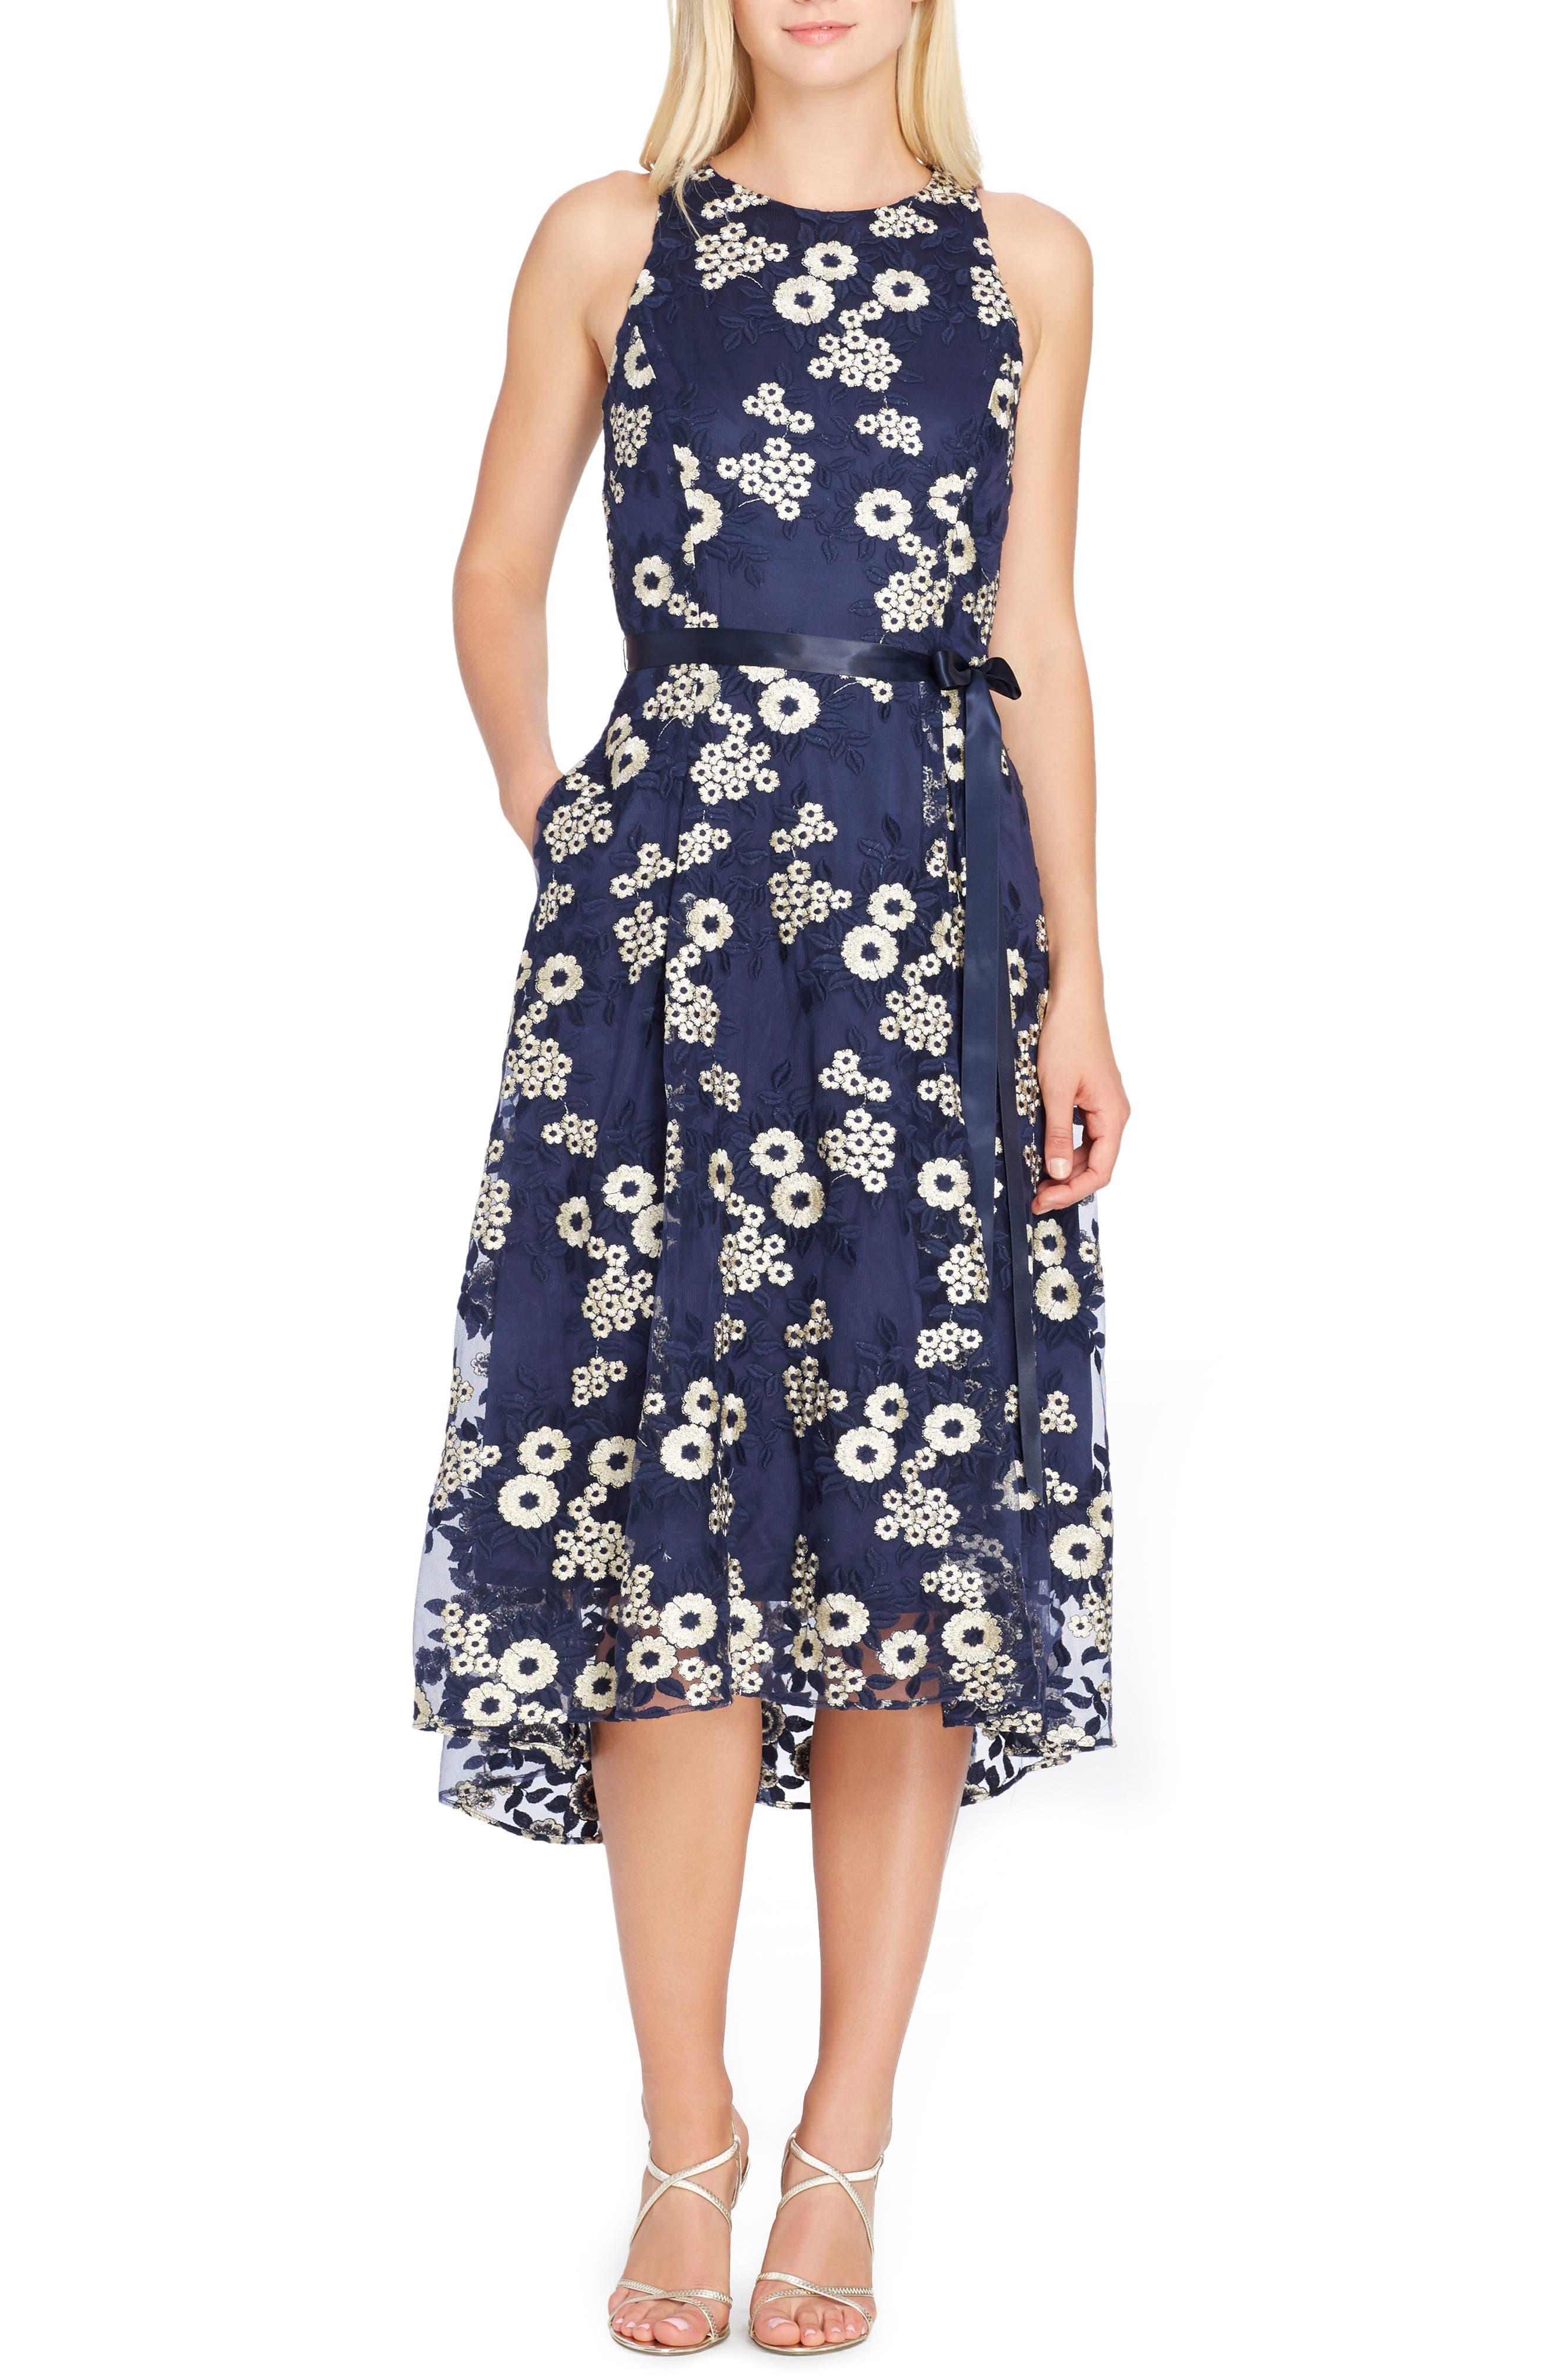 Tahari Floral Embroidered Dress, Blue